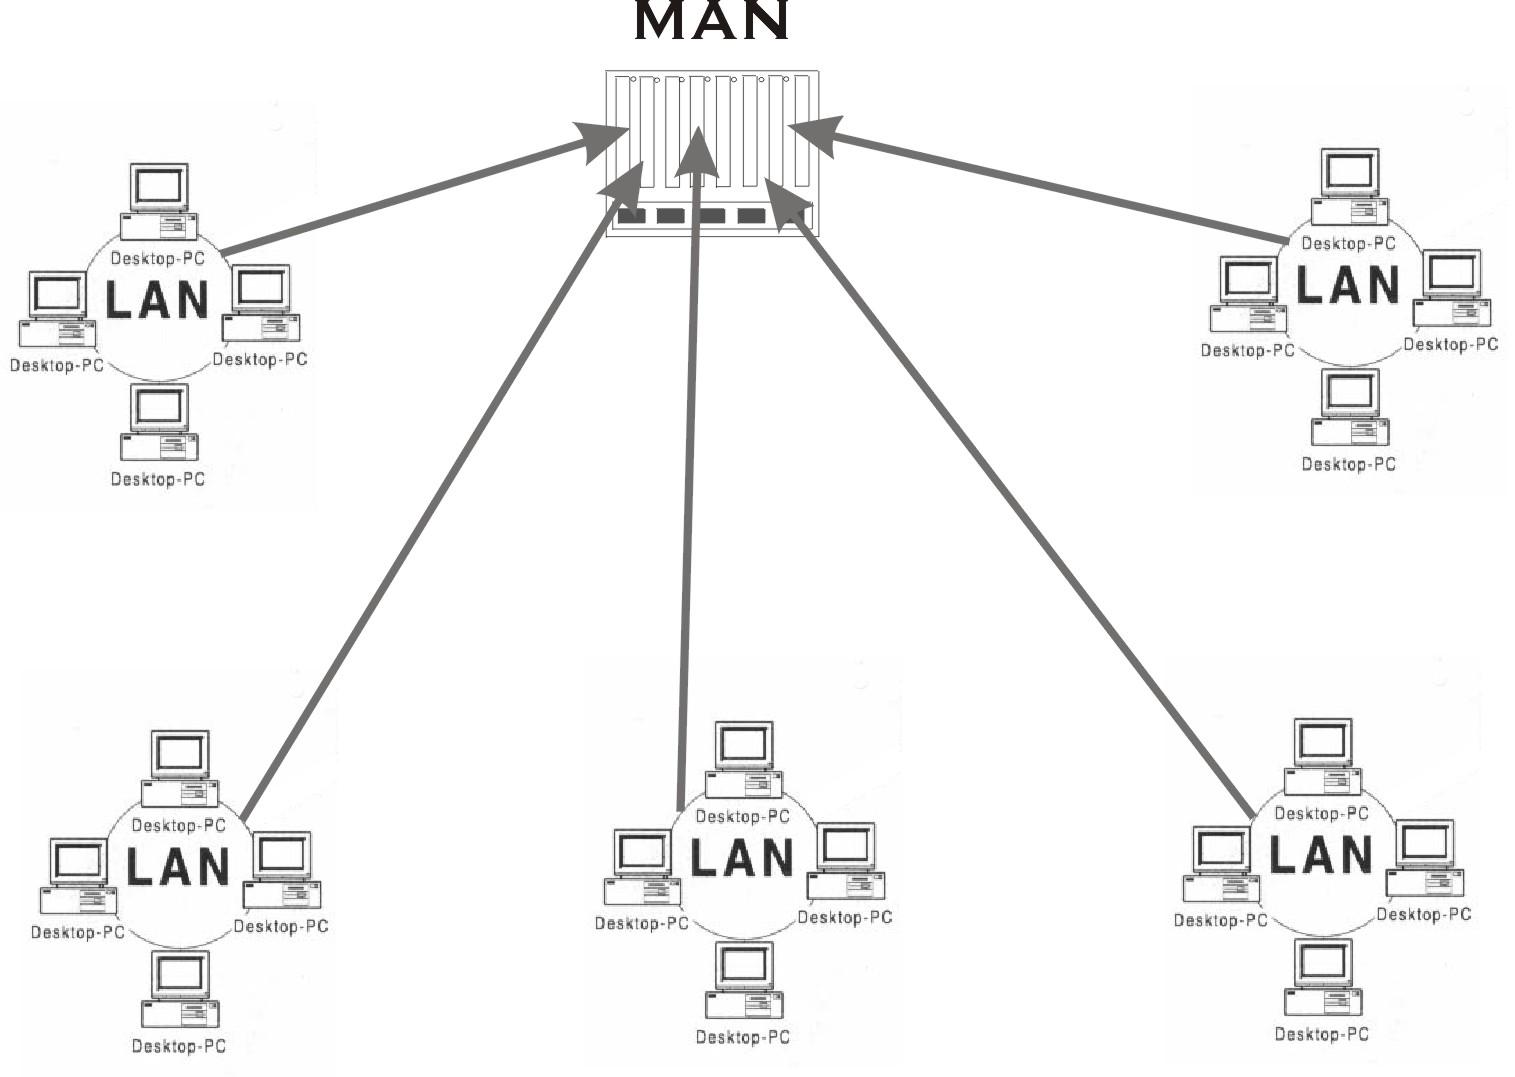 Types of Networks ~ INLIGHTING FAIR